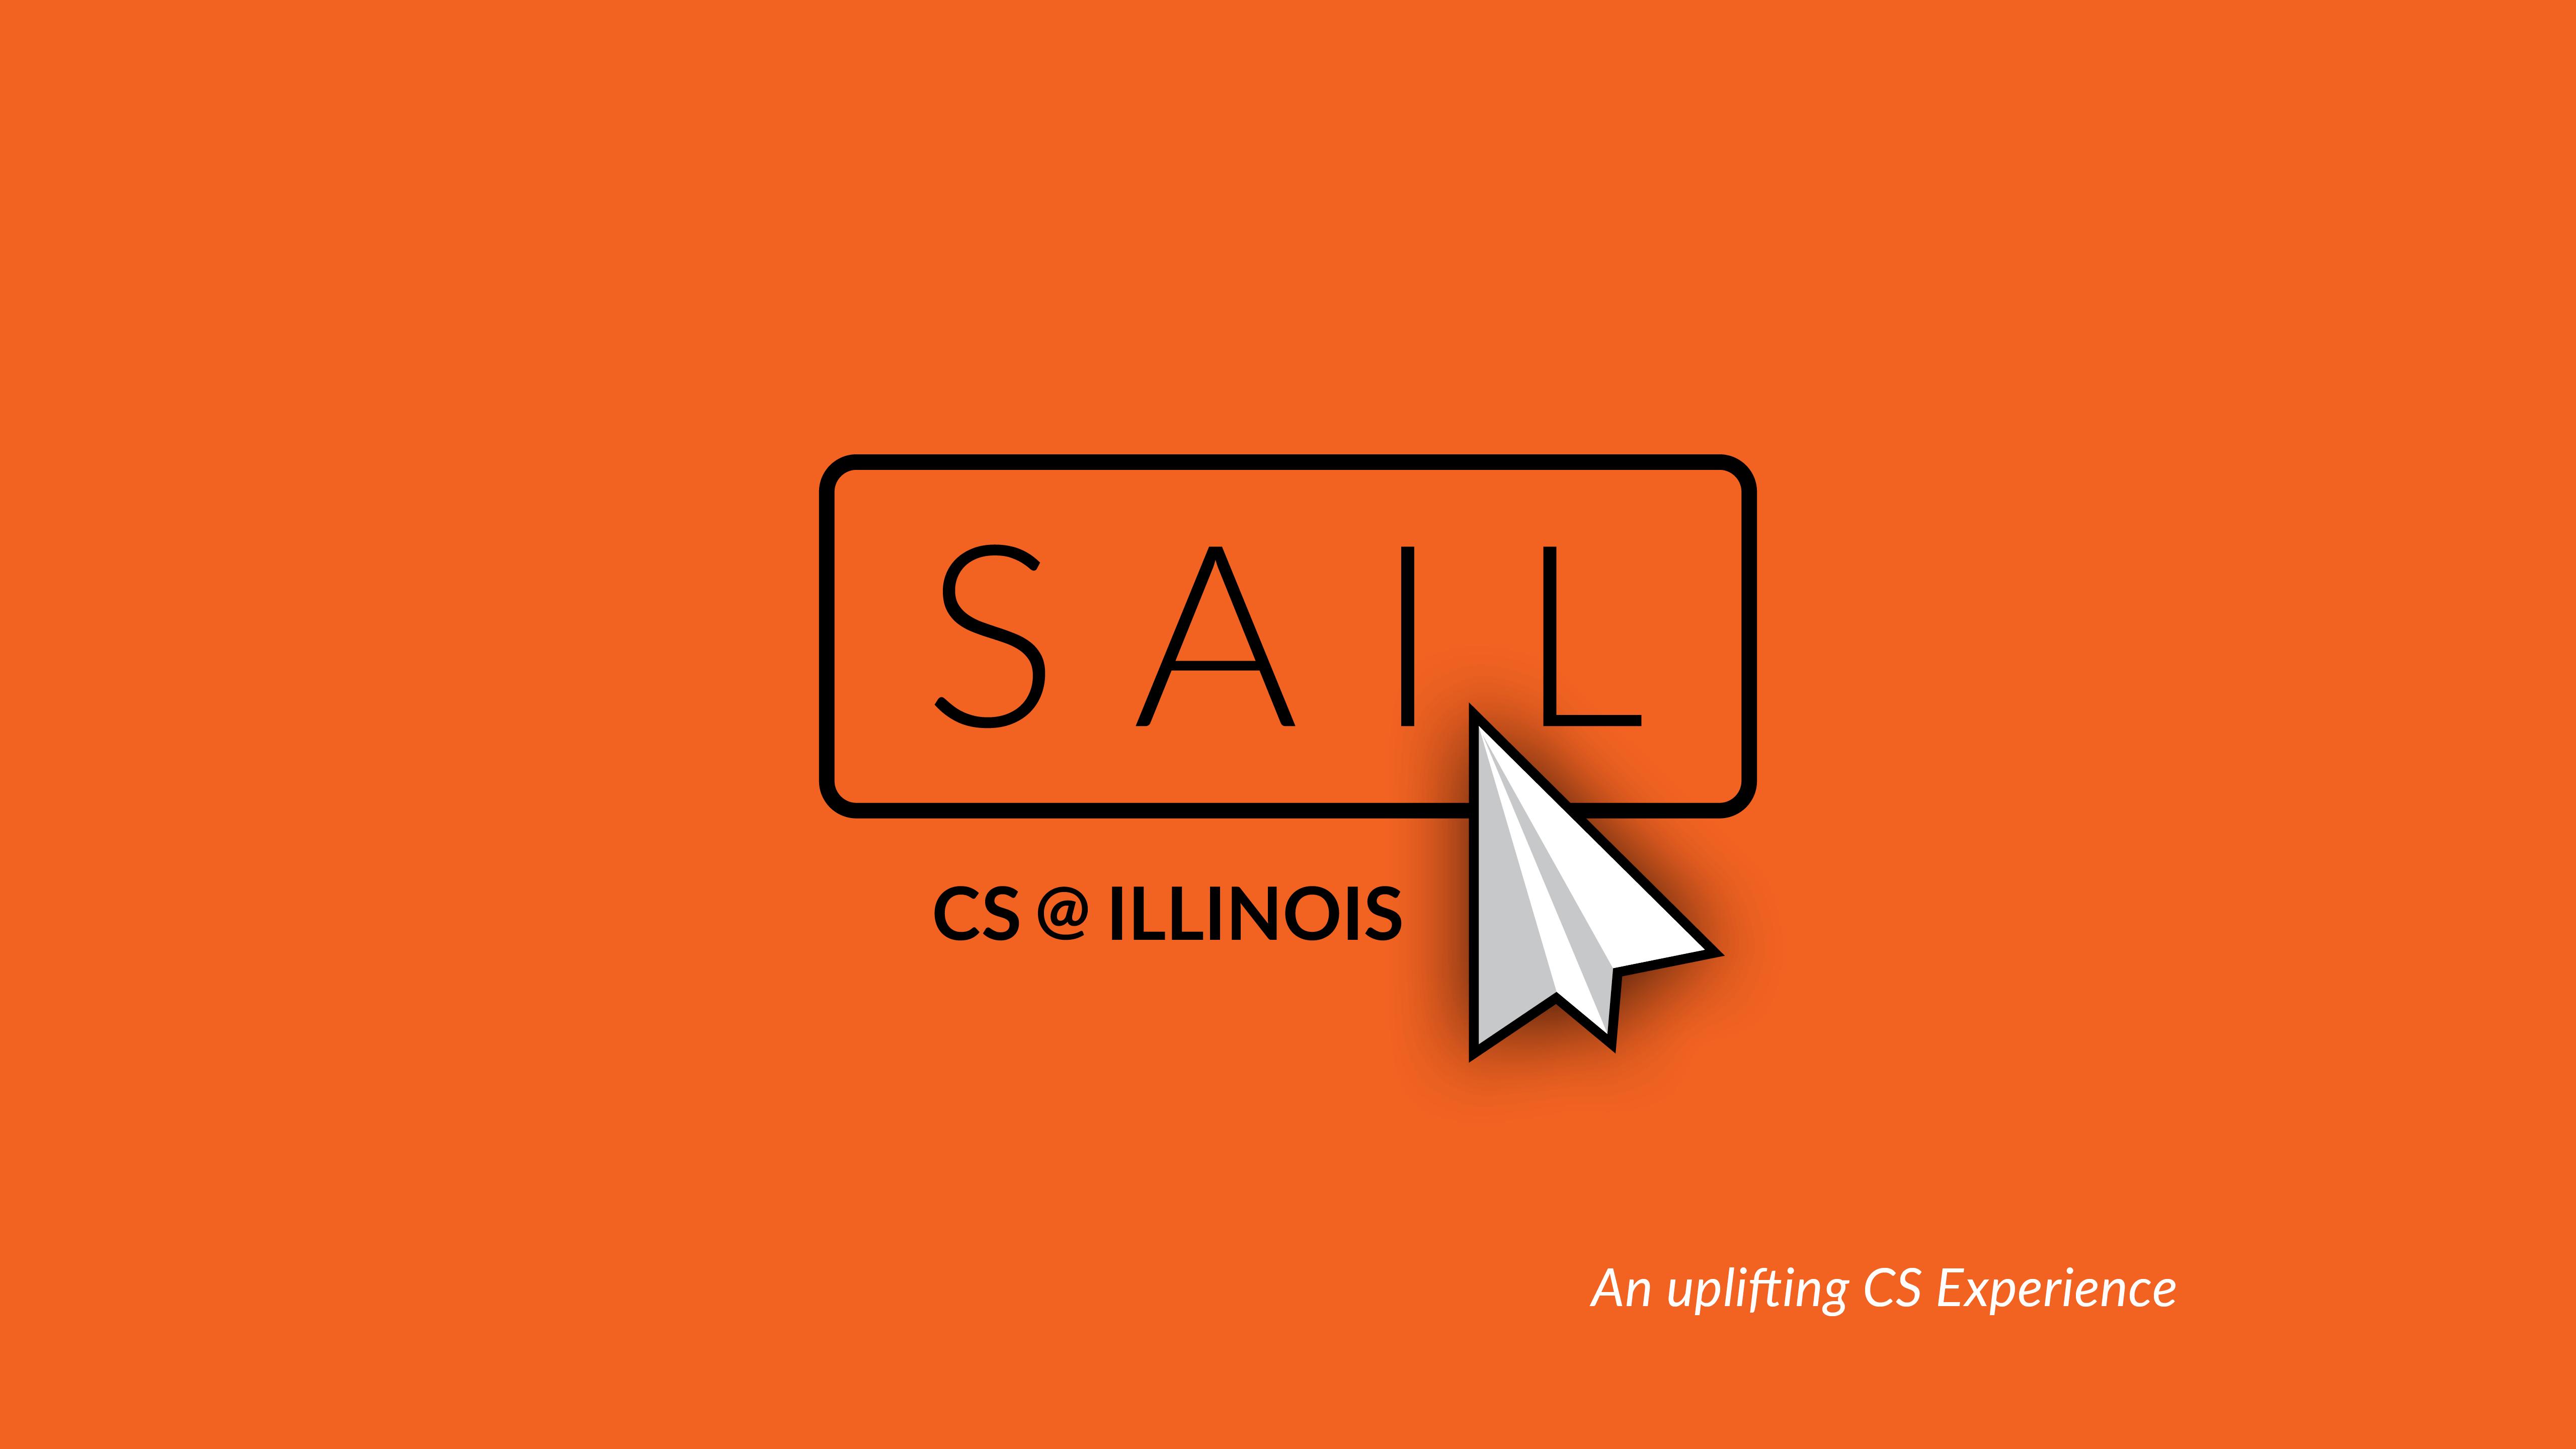 Illinois Computer Science - SAIL